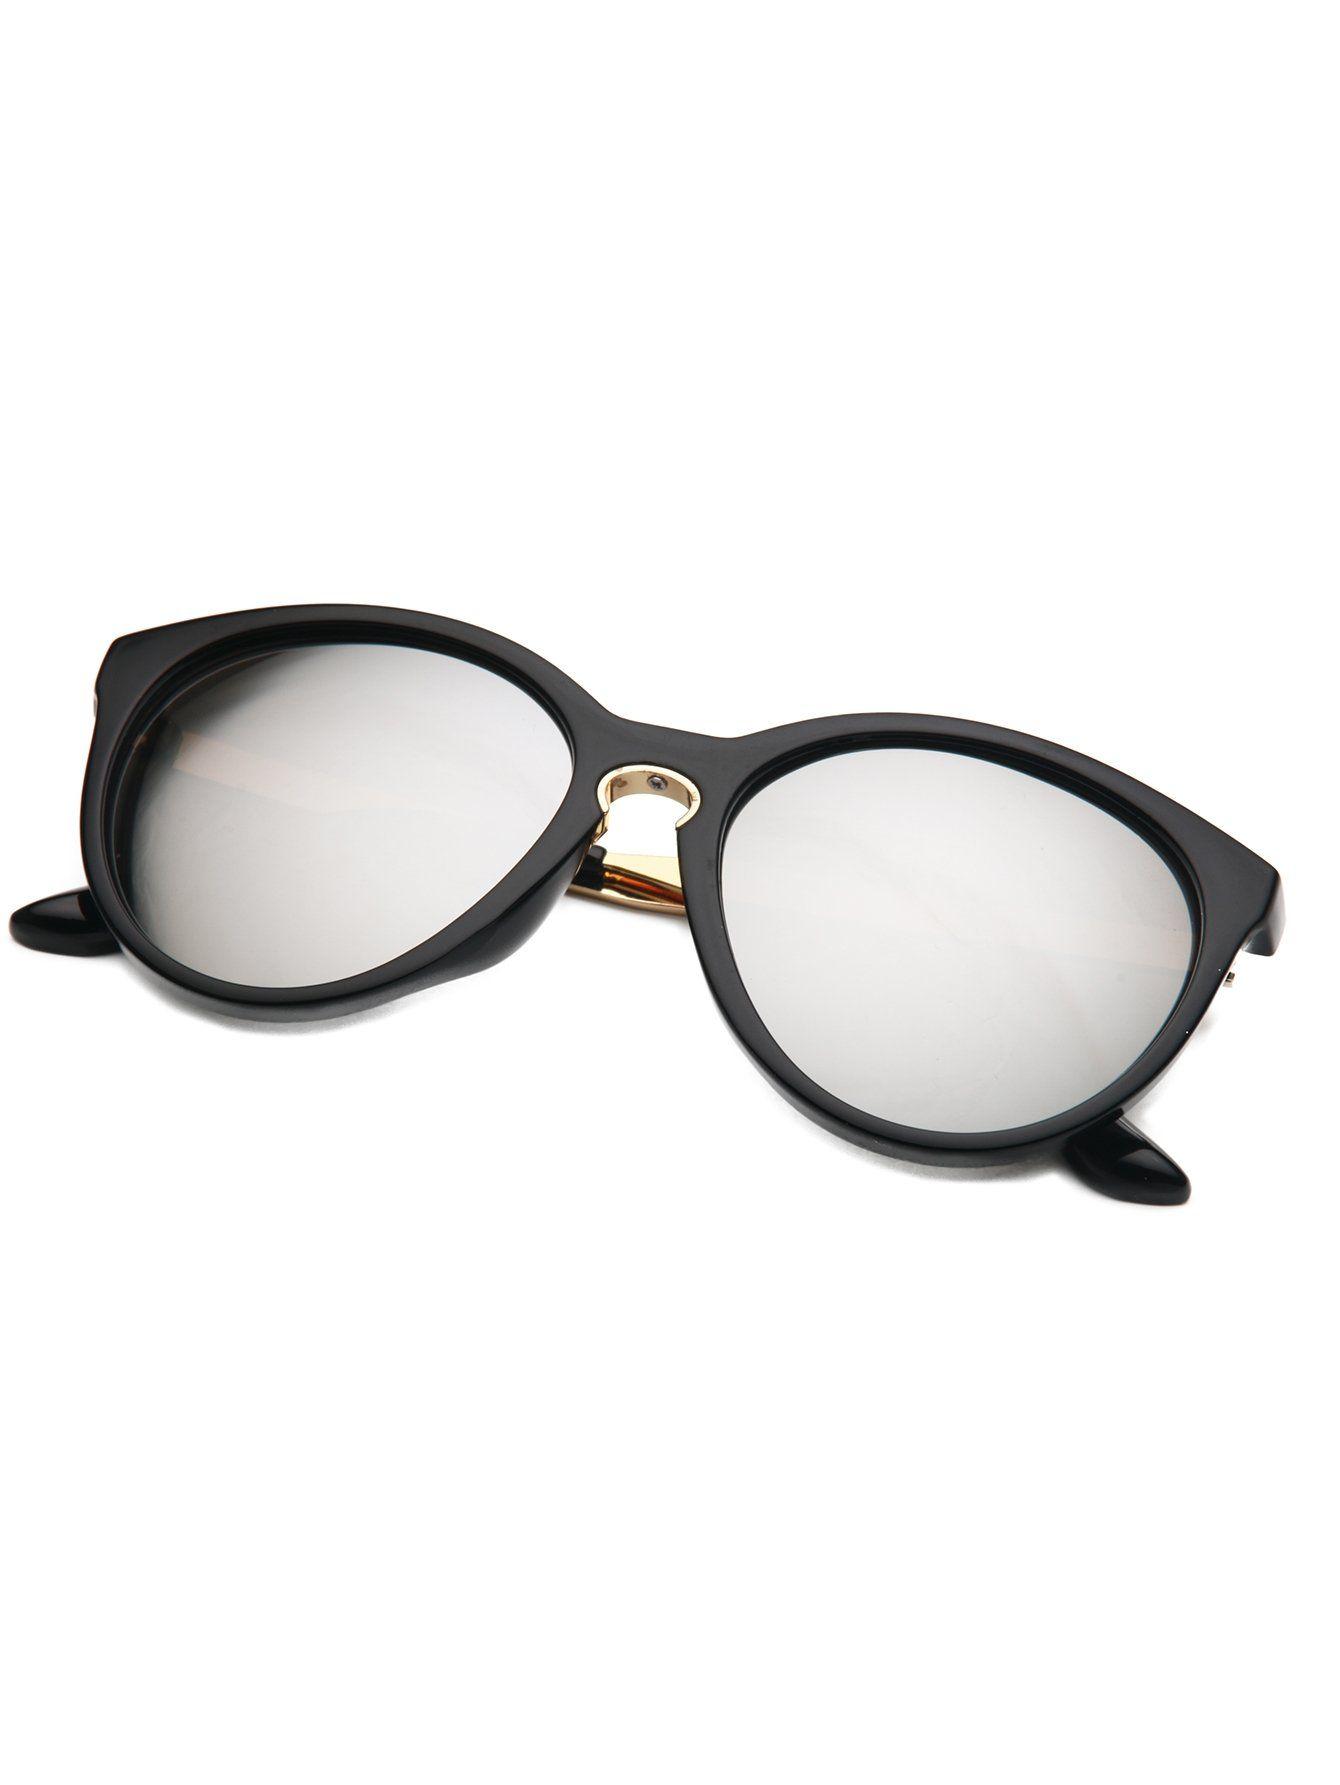 99f410a172 Men Two Tone Frame Sunglasses  10.00 . . . . . .  glasses  me